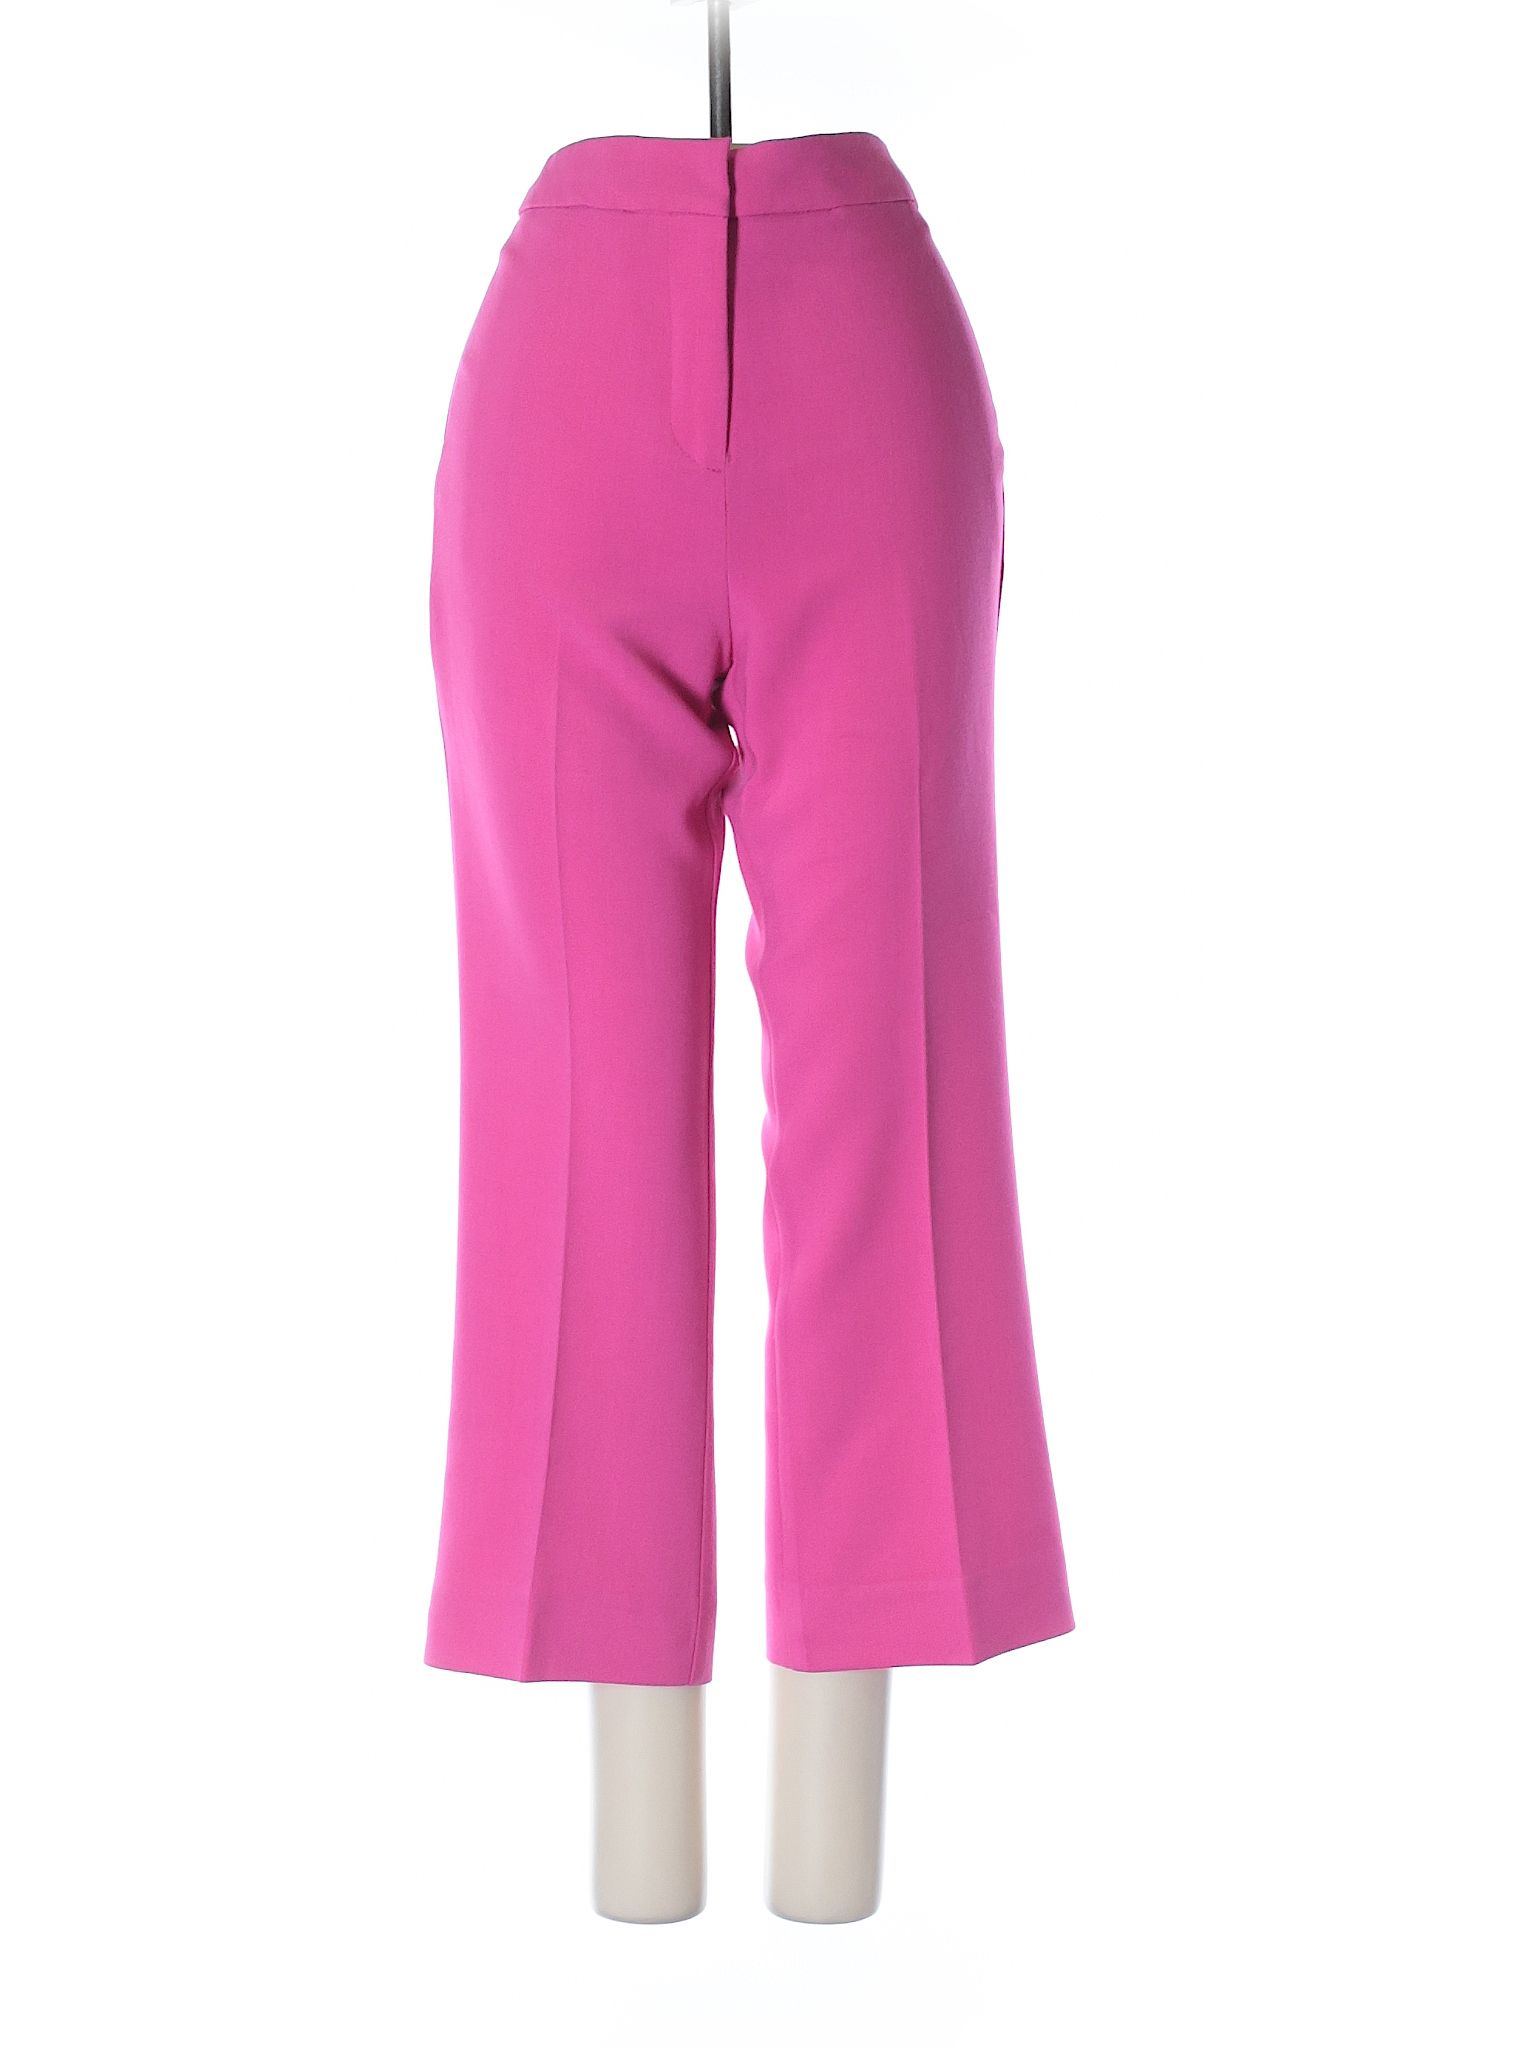 33e12b8137b1fa Victoria Beckham for Target Dress Pants: Size 0 Pink Women's Bottoms -  32830441